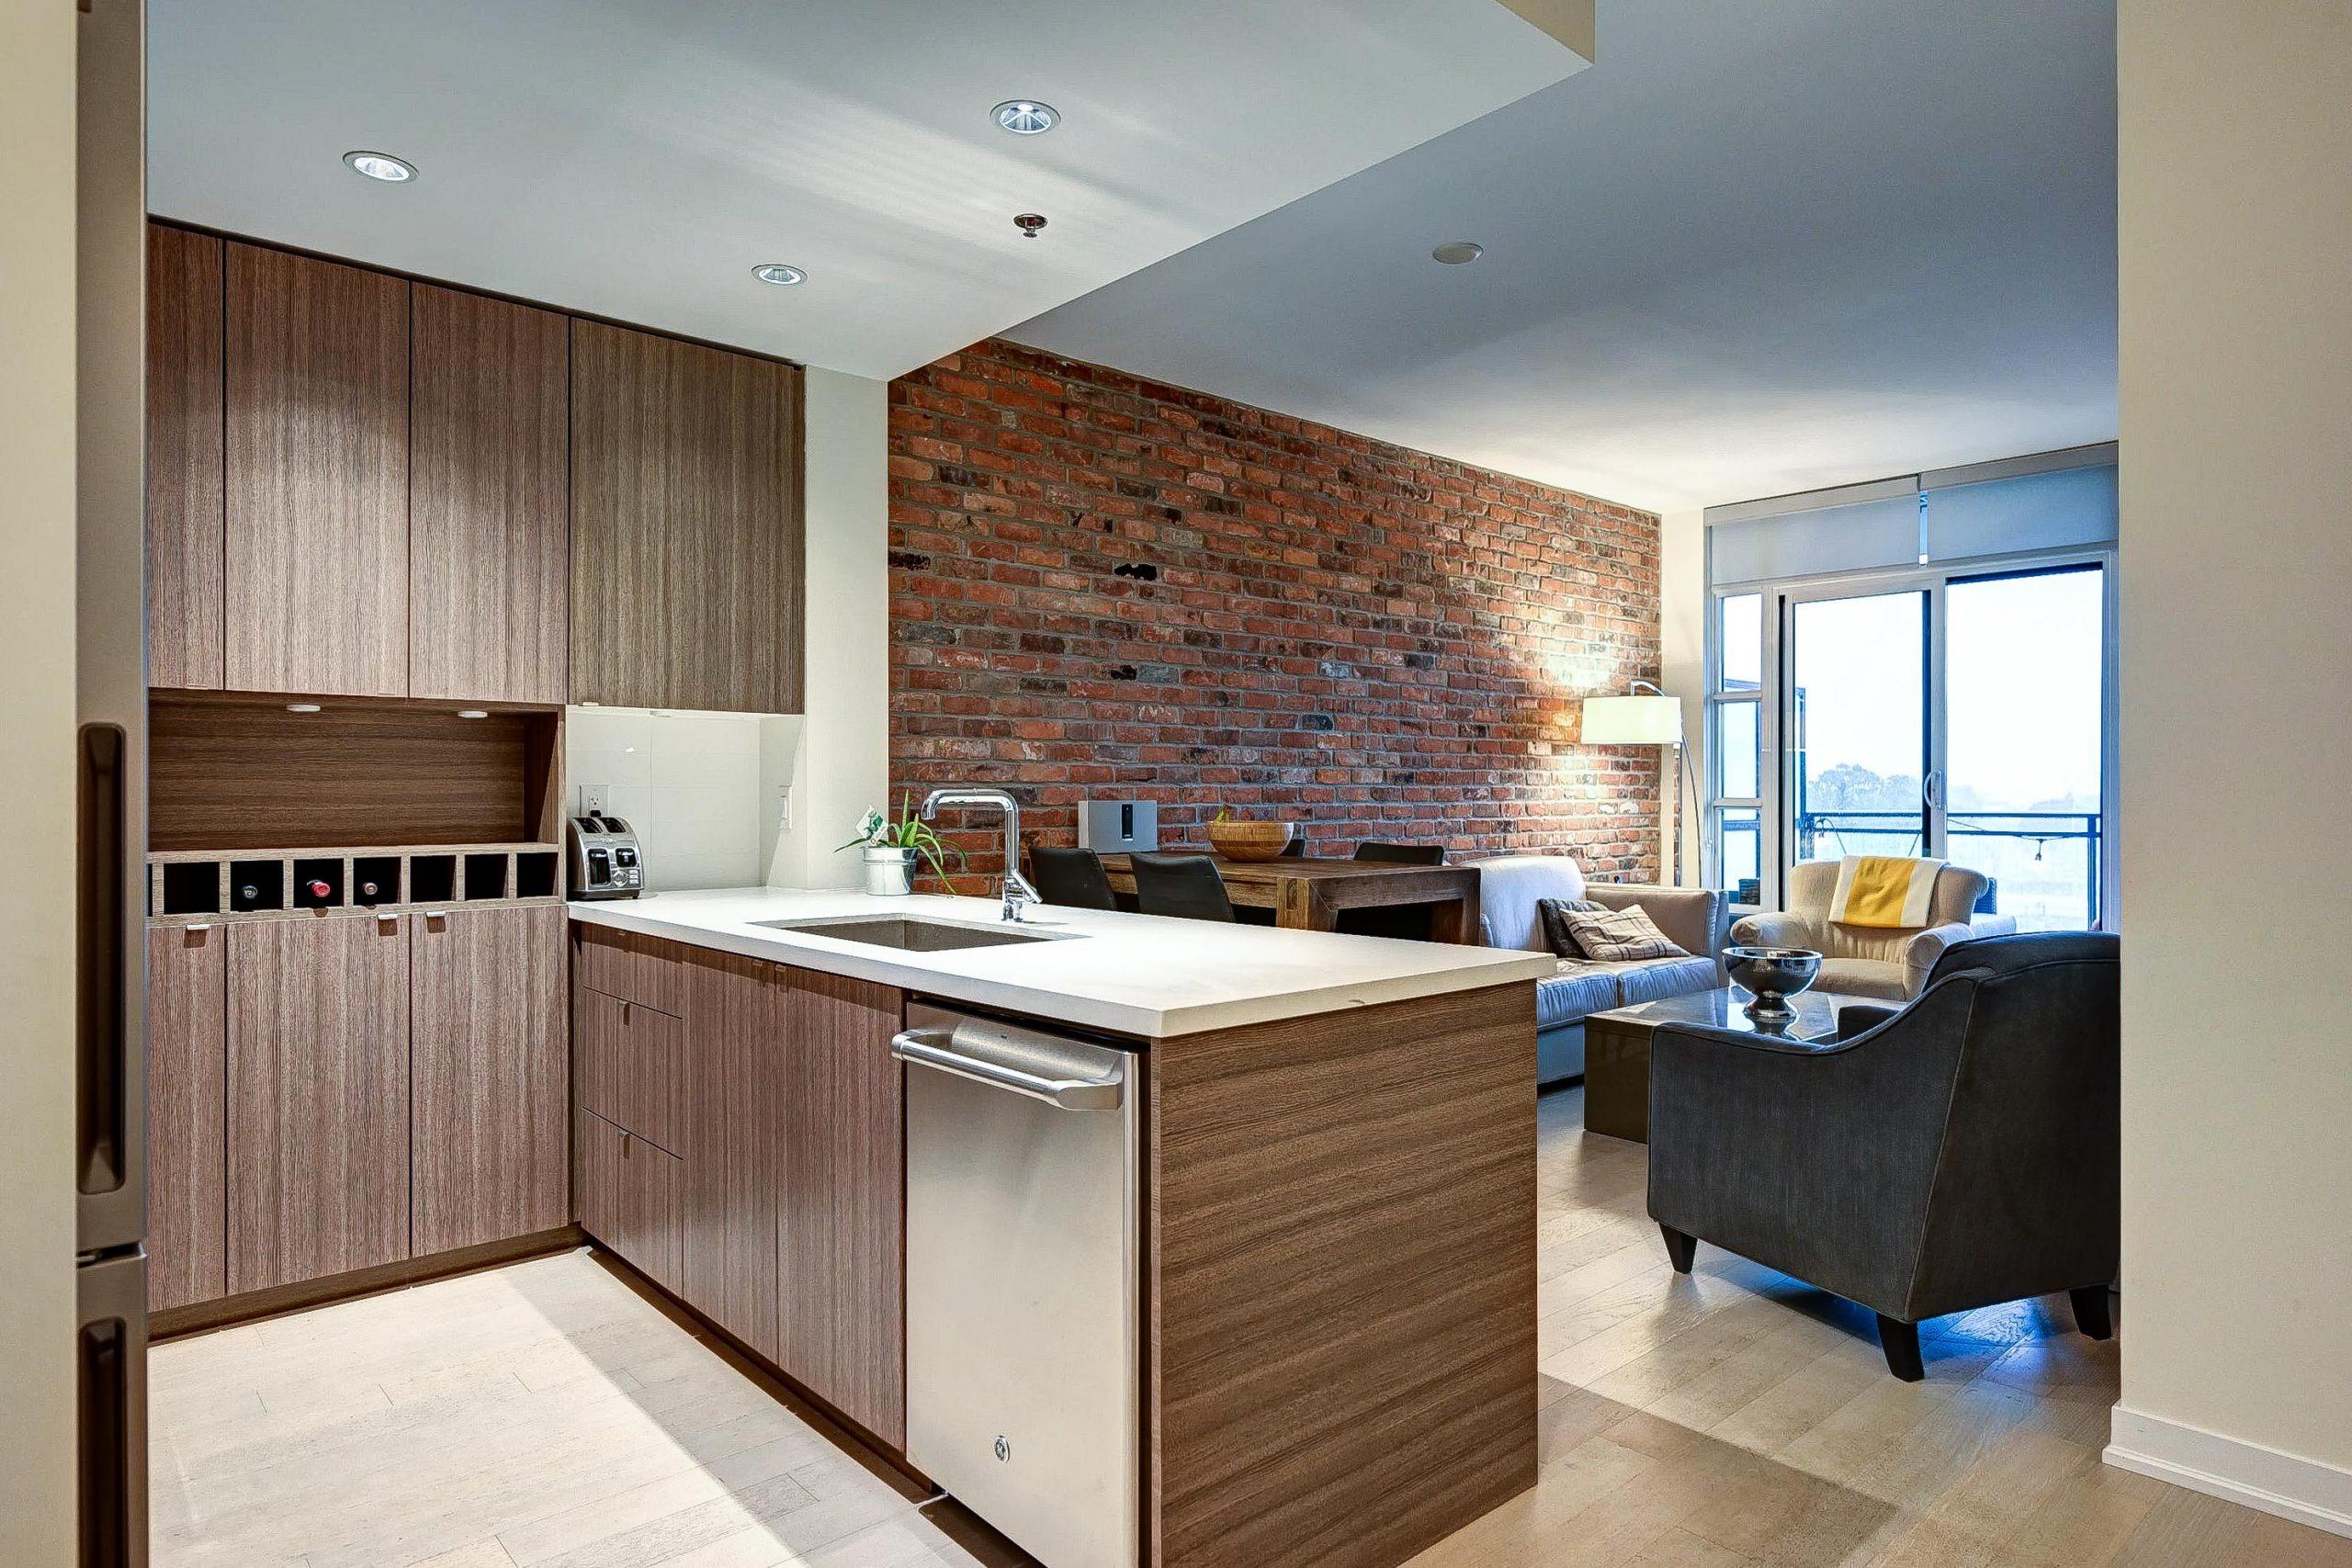 New Toronto Listing: 88 Colgate Ave Unit 622